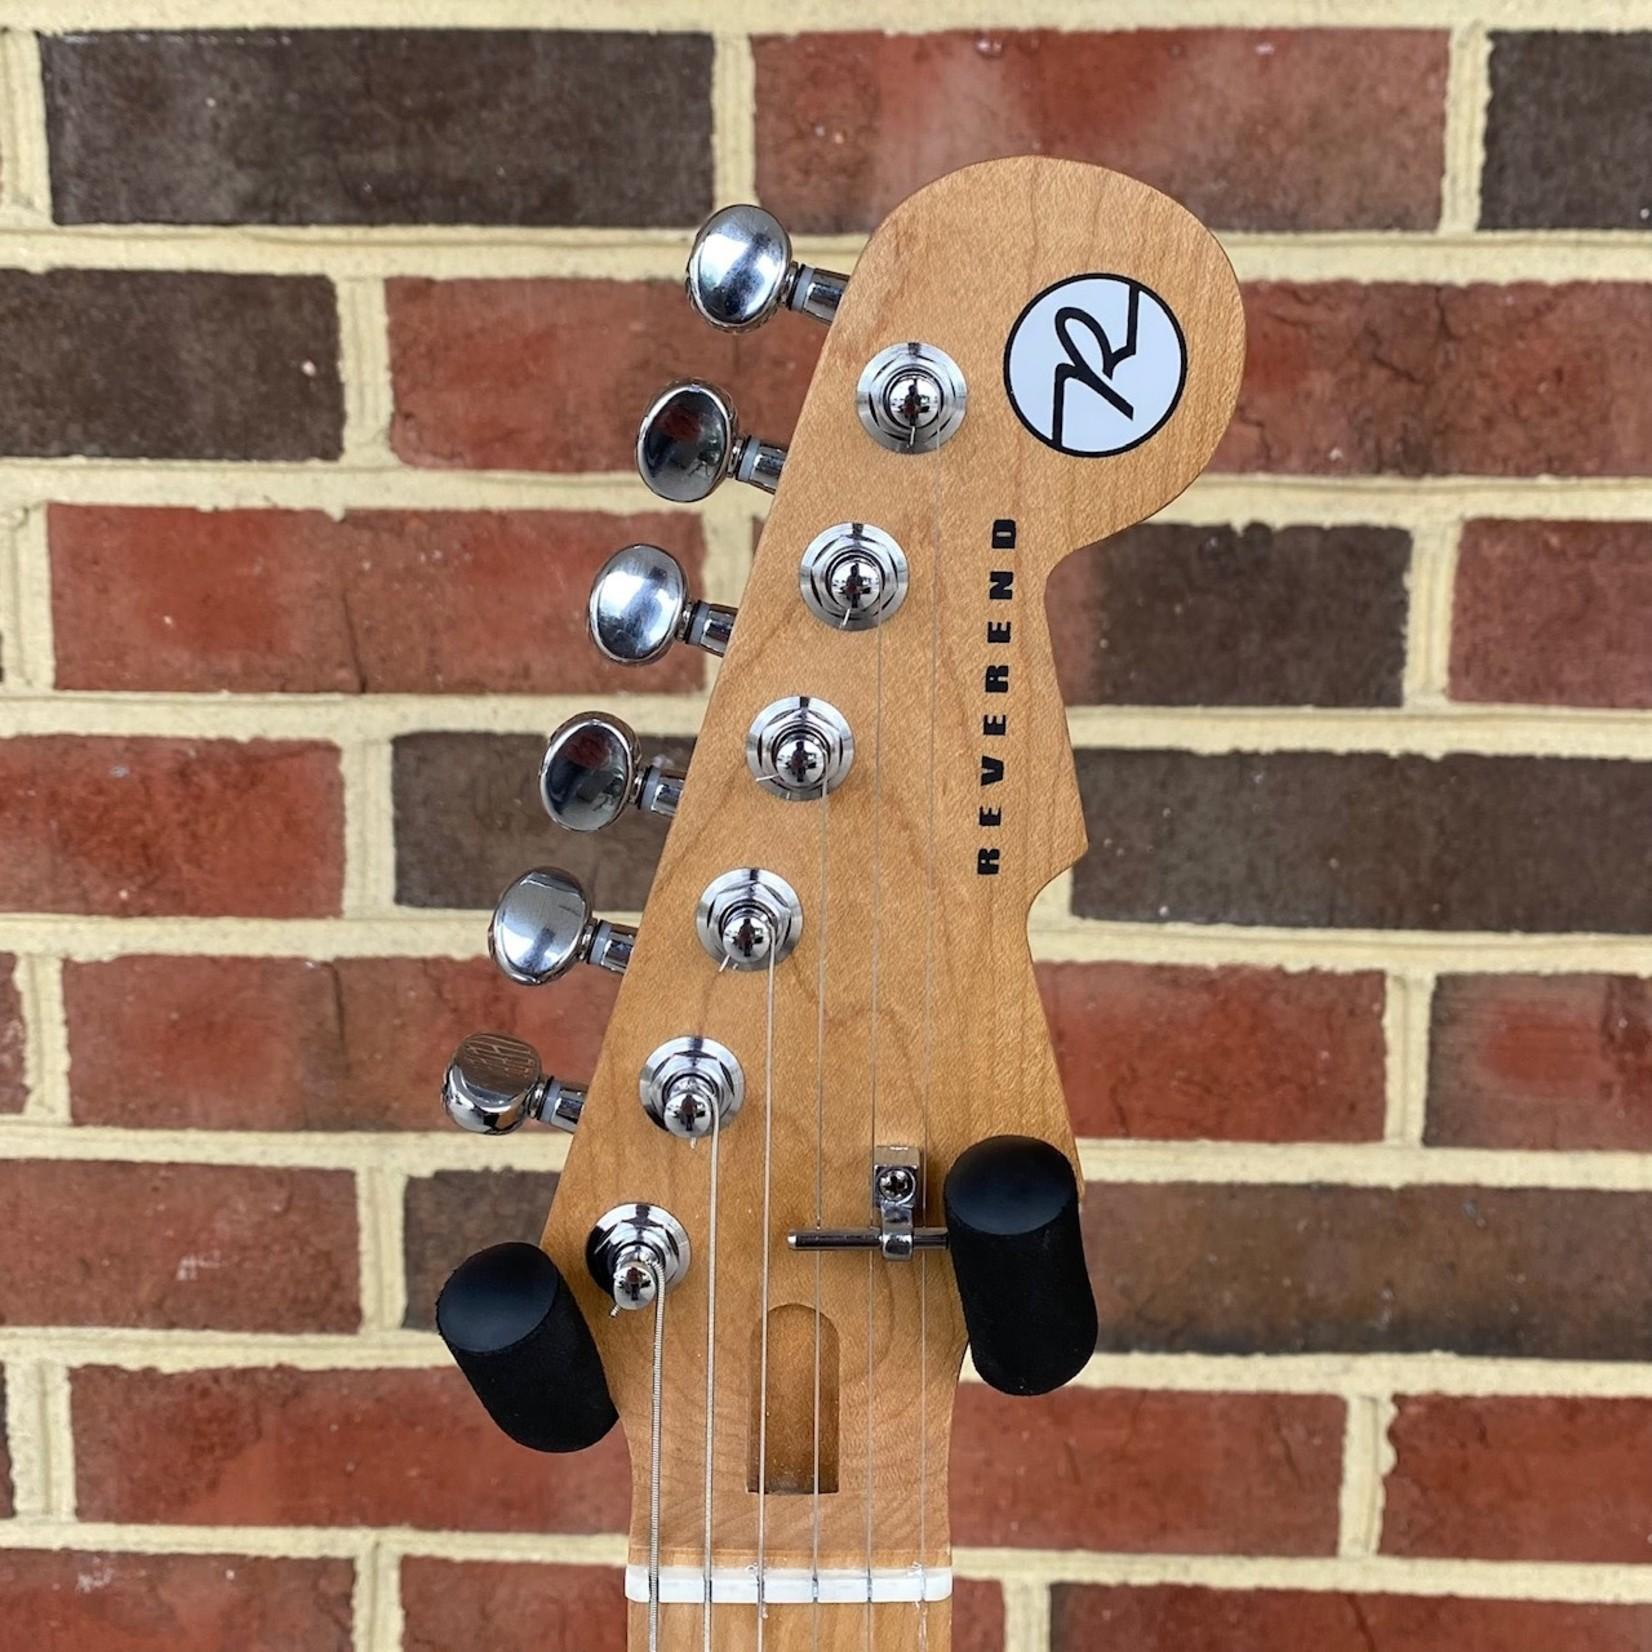 Reverend Reverend Guitars Gil Parris Signature GPS, Midnight Black, Roasted Maple Neck and Fretboard, Korina Body, Locking Tuners, Fishman Fluence Pickups